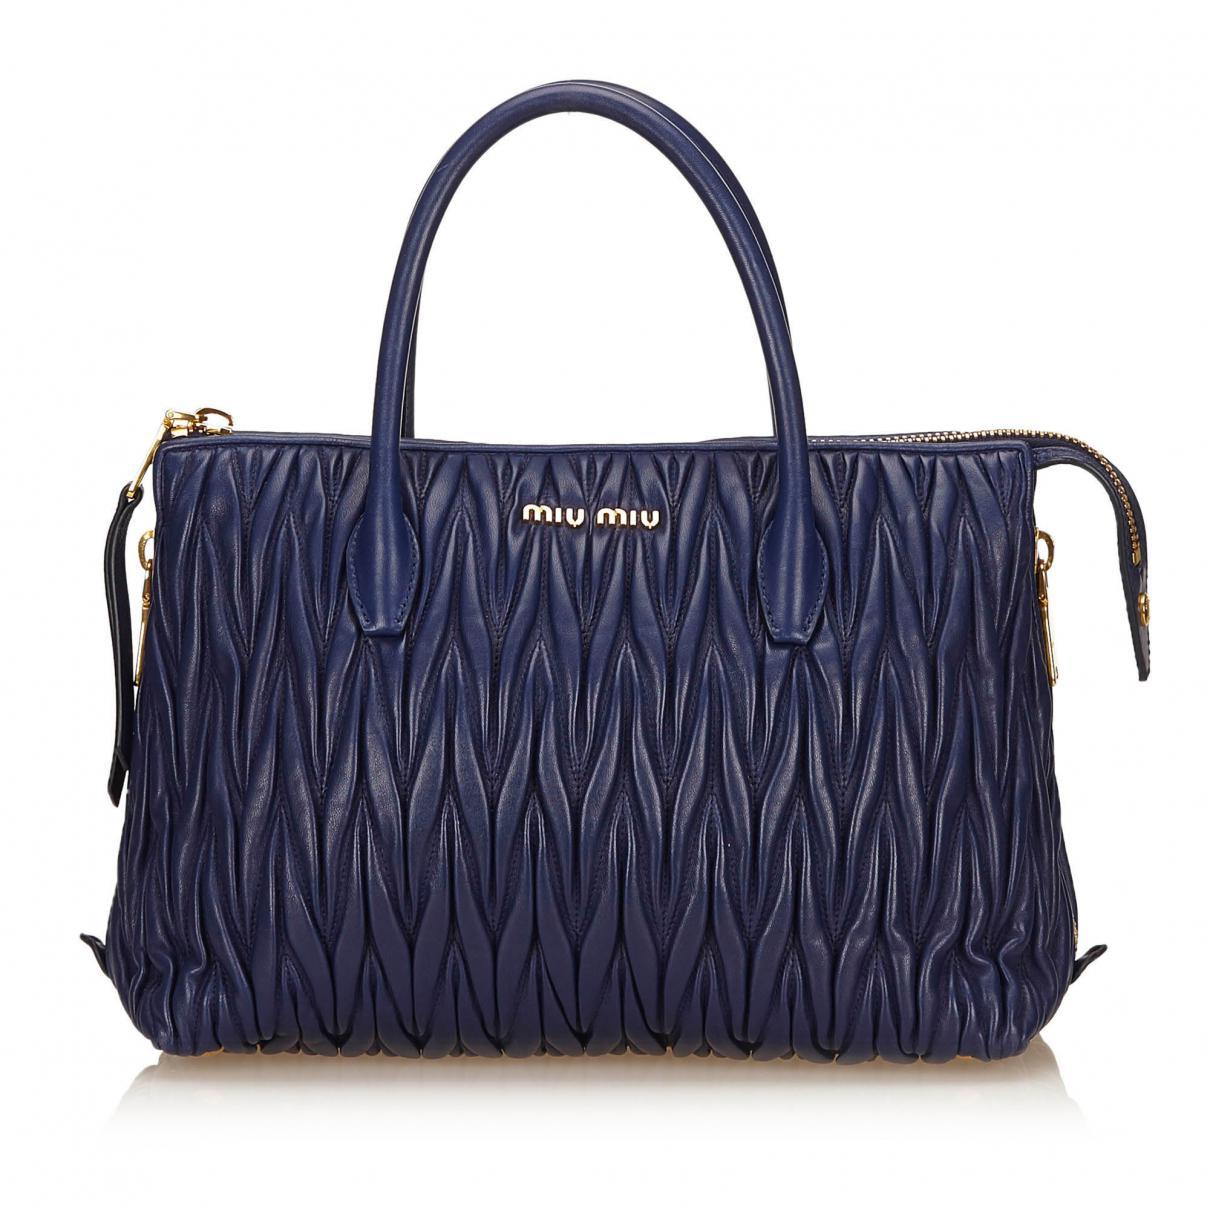 Pre-owned - Blue Leather Handbag Miu Miu sl1CDs